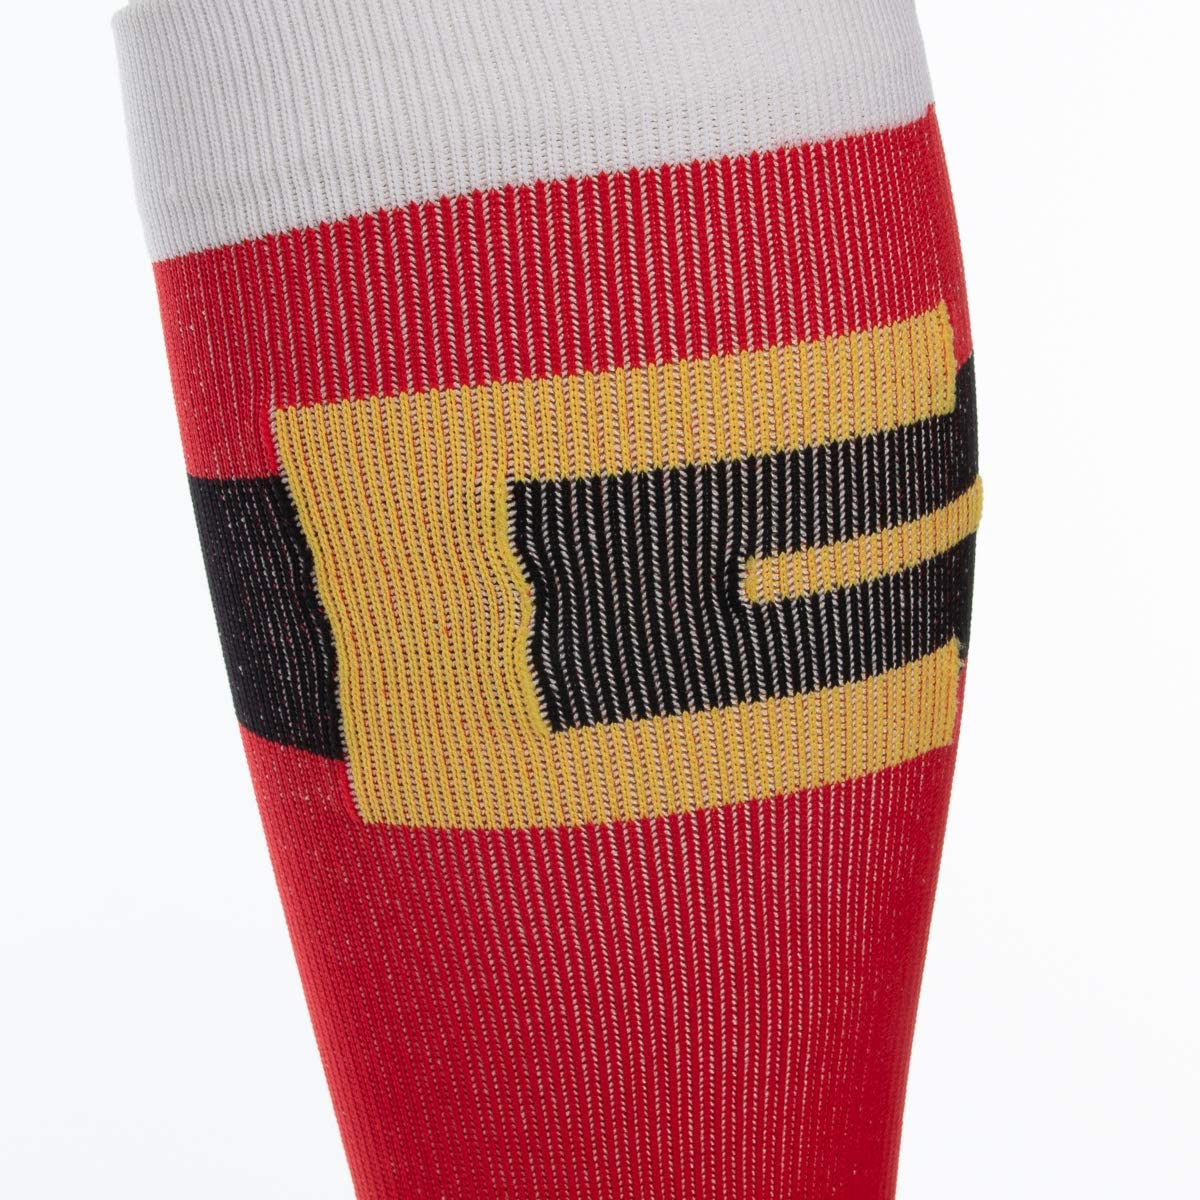 Xertia Santa Festive Christmas Compression Socks Women Compression Socks For Nurses Sports Athletic Socks Compression Stockings Christmas Socks At Amazon Women S Clothing Store